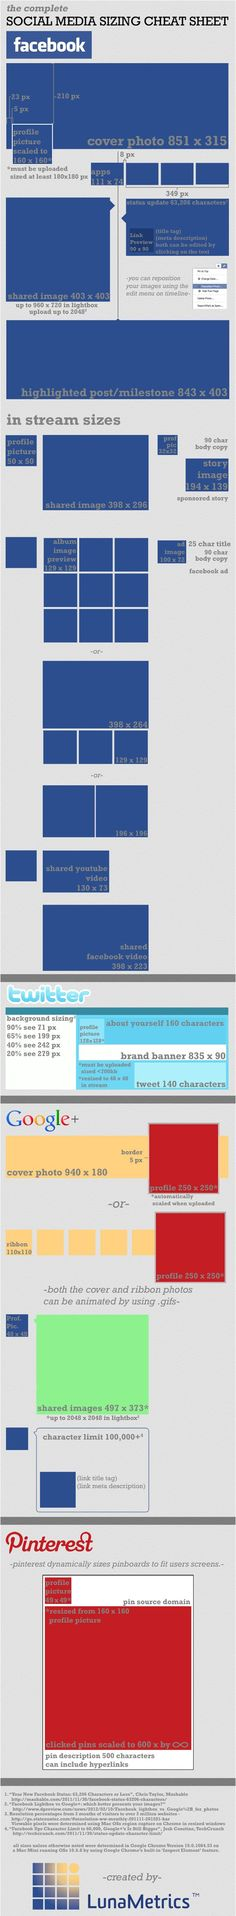 Medidas de imagenes, backgrounds, banners, etc,...de todas las redes sociales,